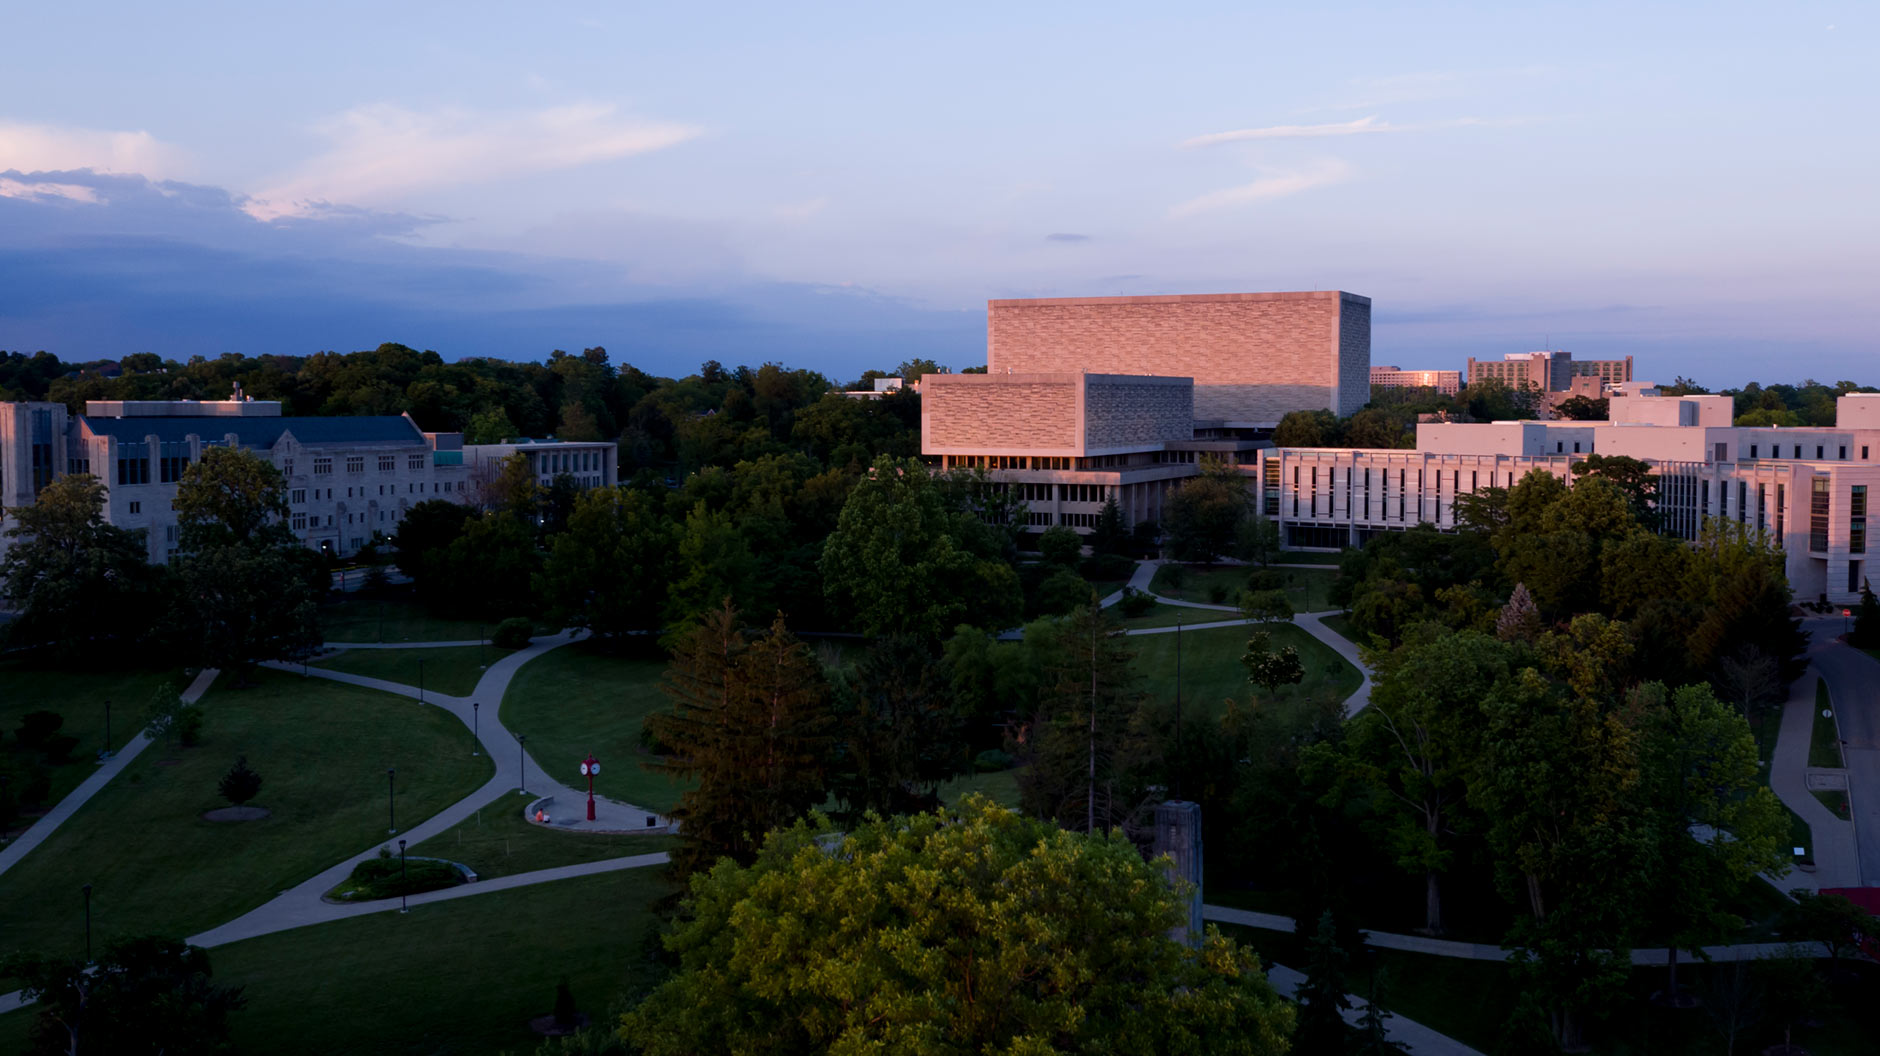 Indiana University Bloomington Summer Campus Scenics